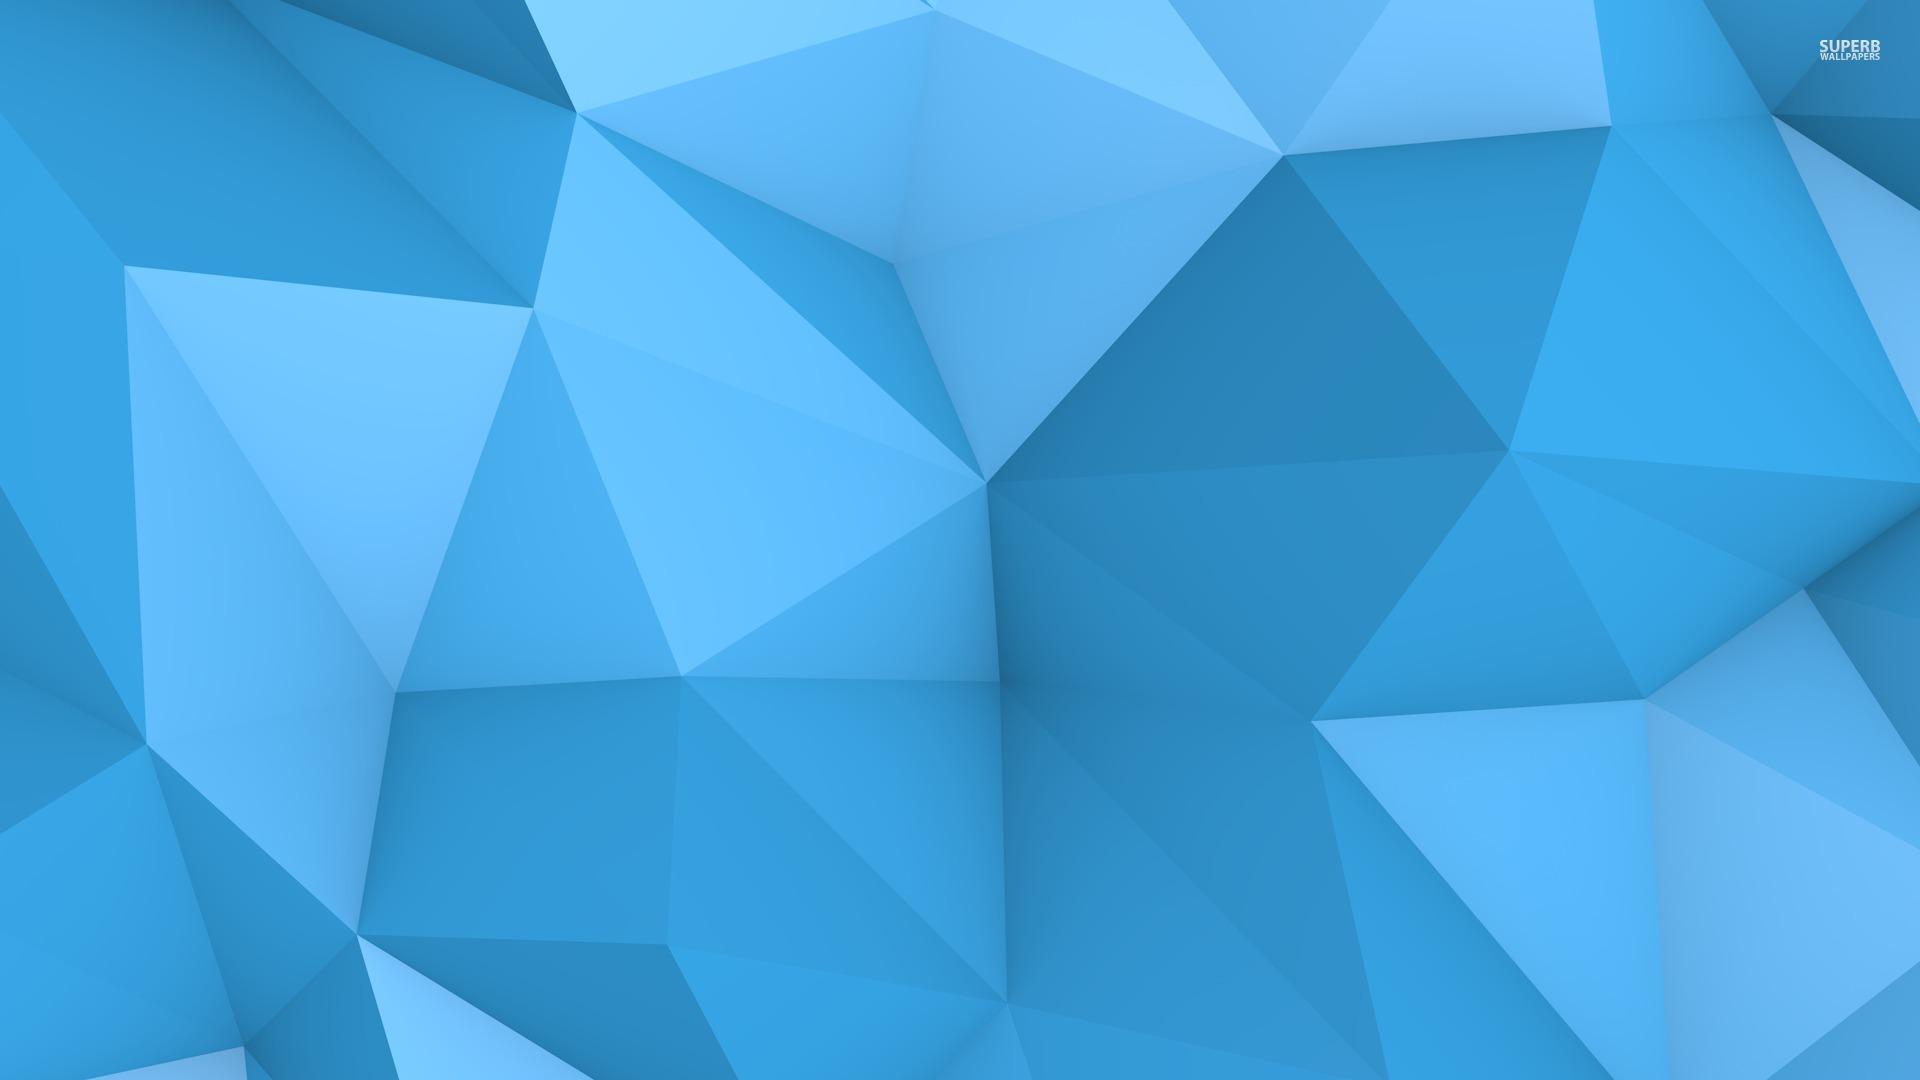 Free Download 3d Polygons Shapes Wallpaper 1920x1080 For Your Desktop Mobile Tablet Explore 49 3d Shapes Wallpaper Abstract Shapes Wallpaper Shape Wallpaper